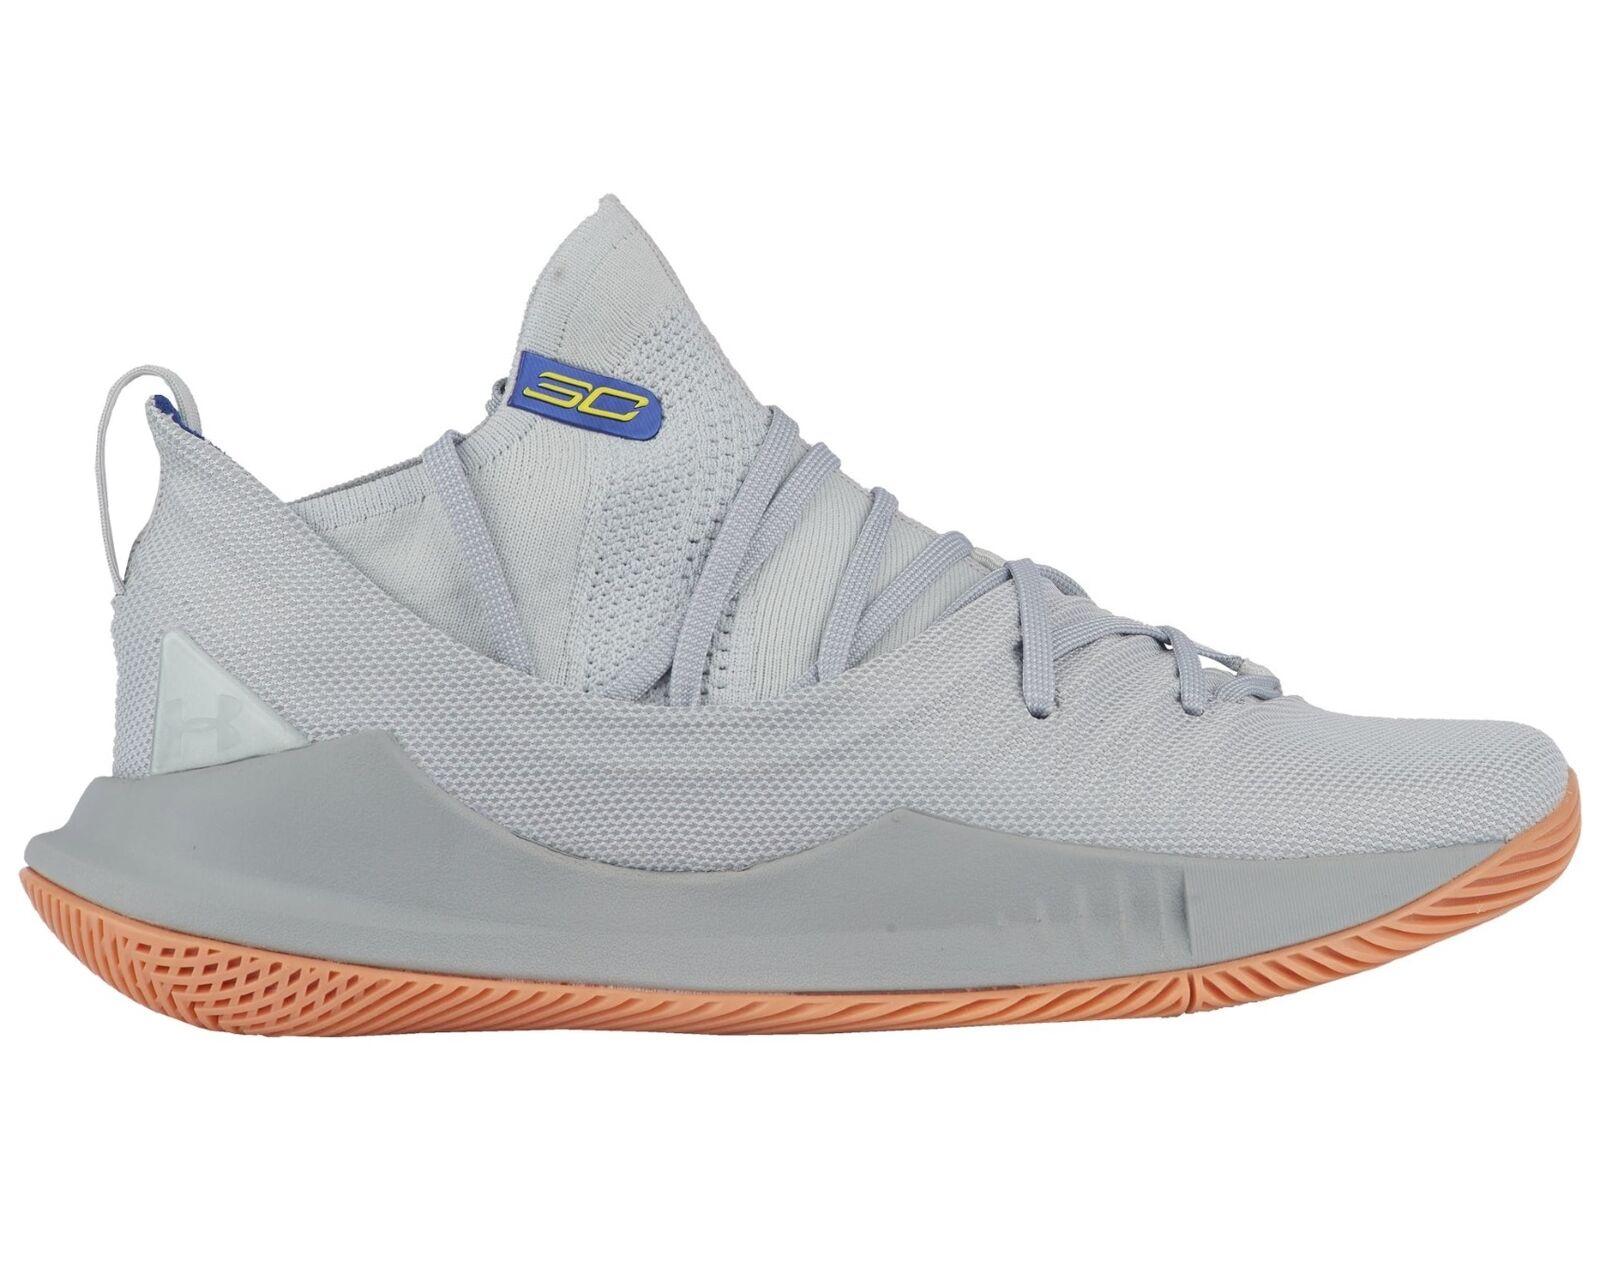 Under Gum Armour Curry 5 Uomo 3020657-105 Tokyo Grey Gum Under Basketball Shoes Size 10.5